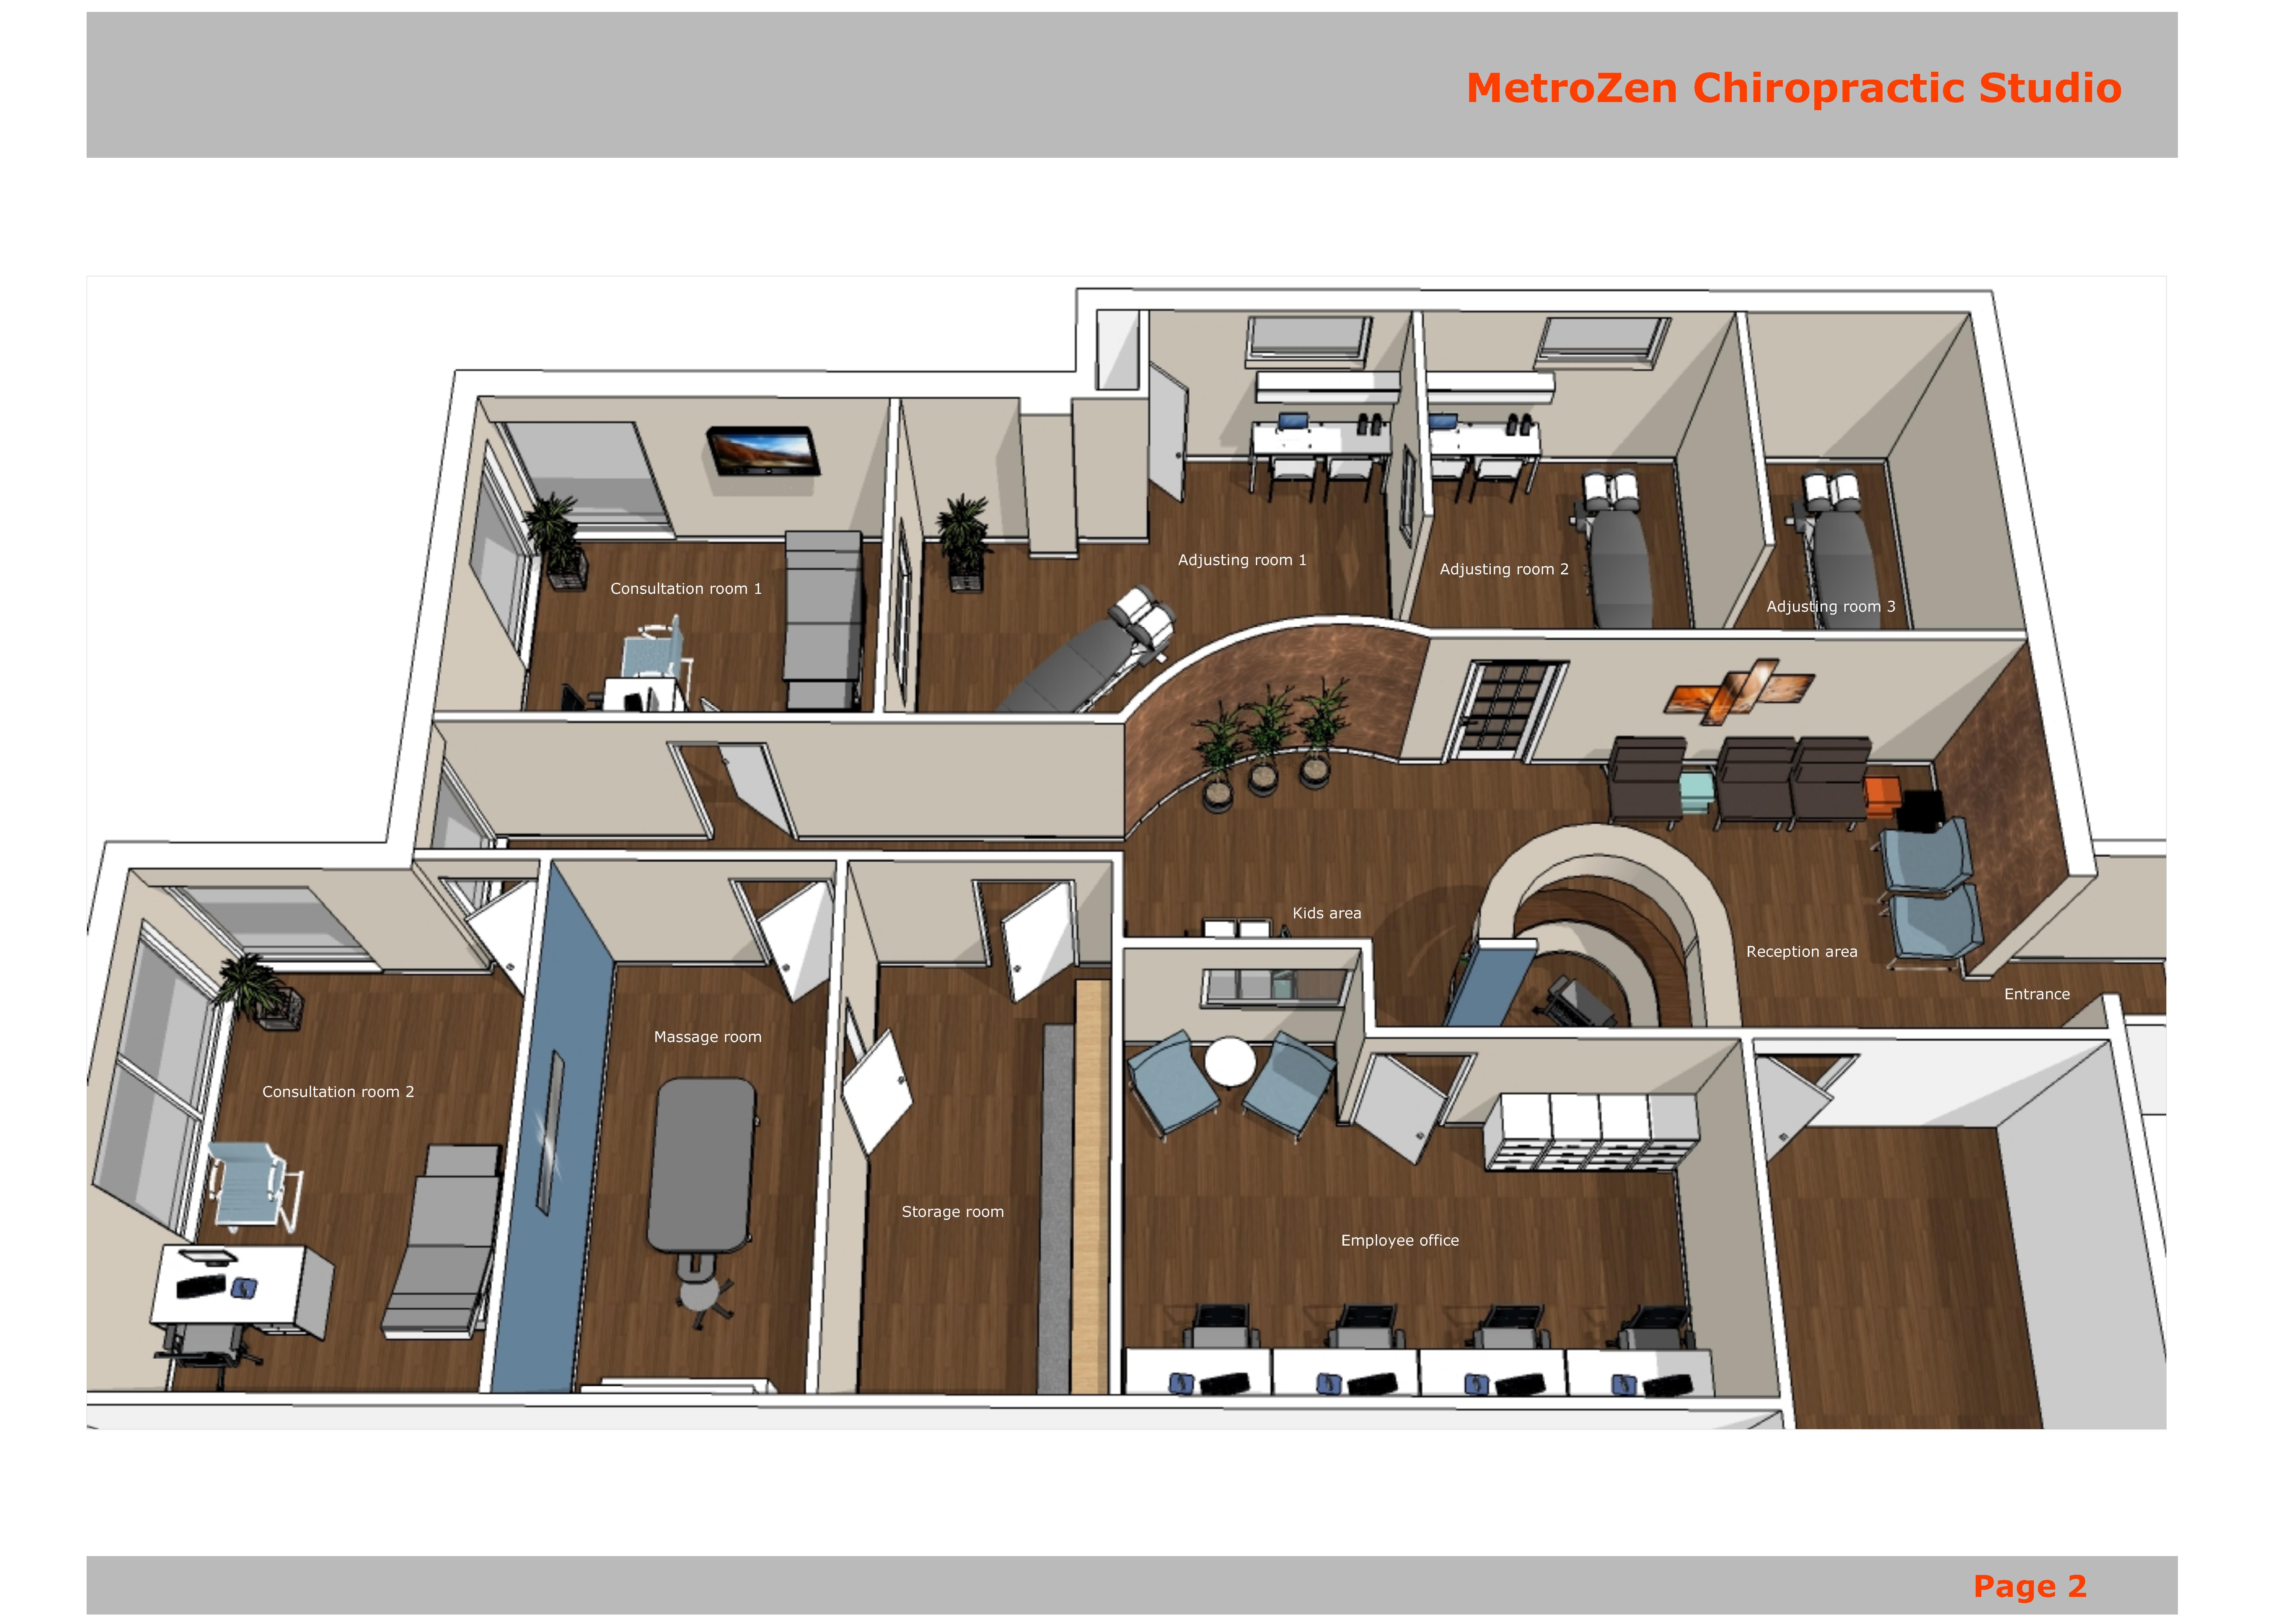 Healthcare designed by gordana potezica metrozen Chiropractic office designs